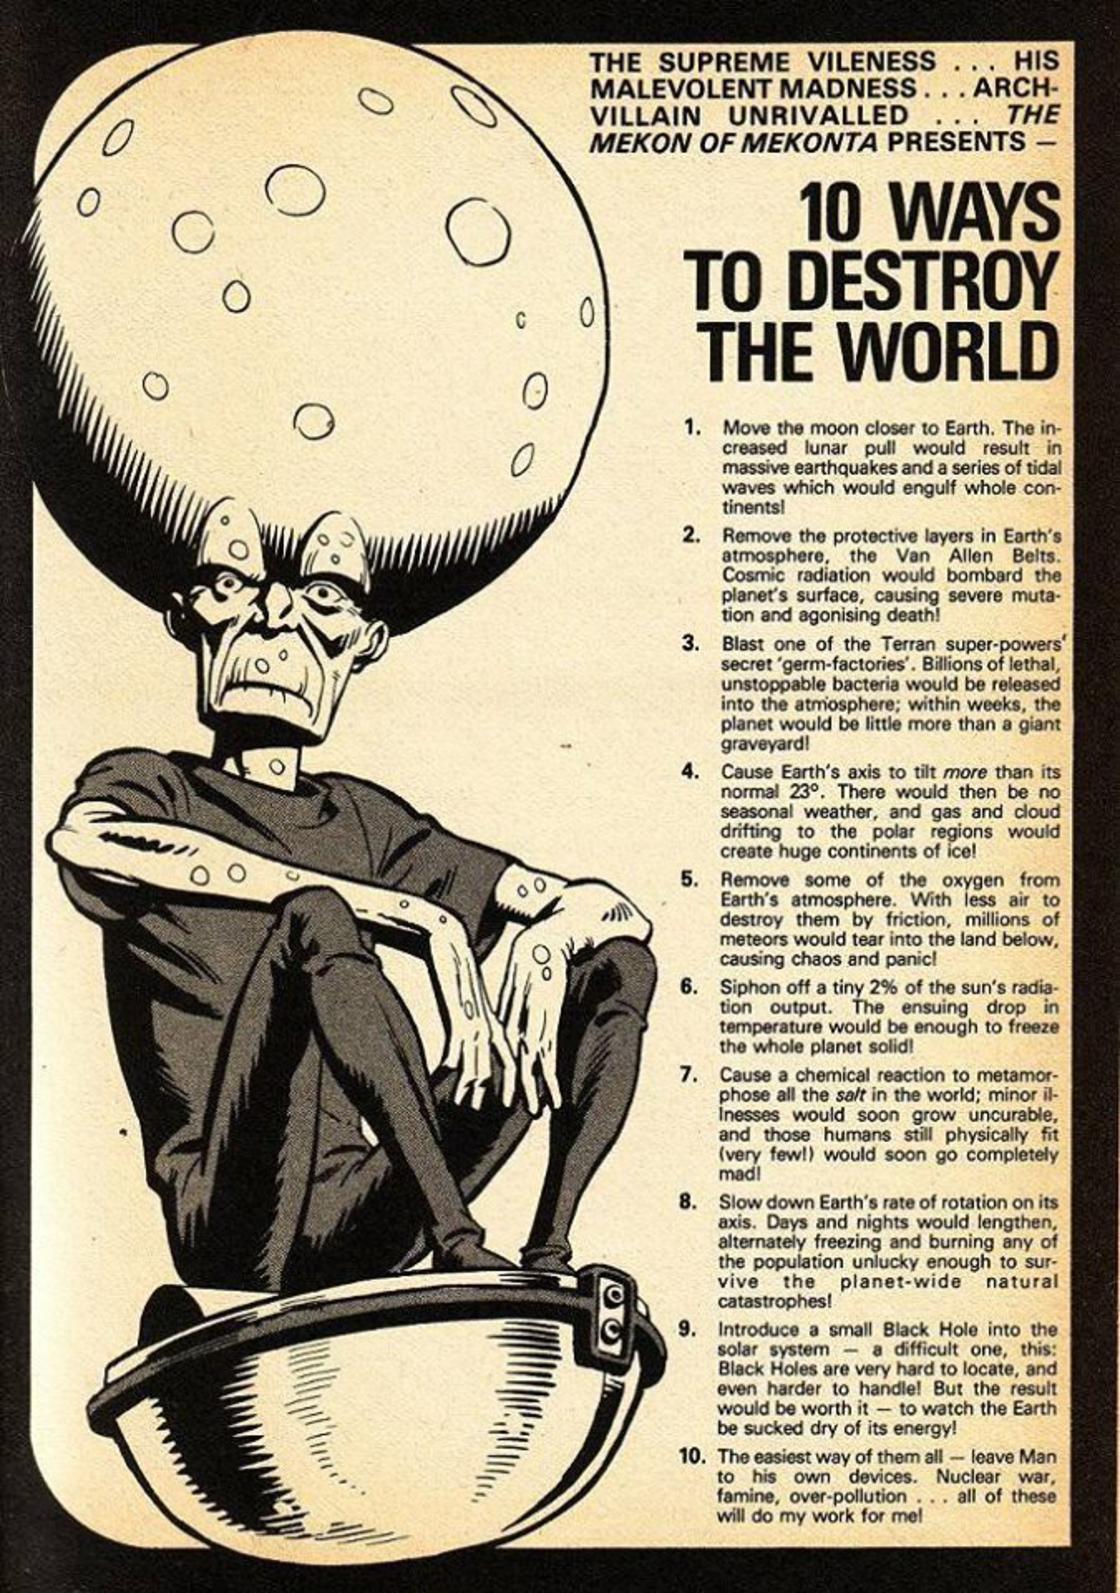 10 Ways to Destroy The World